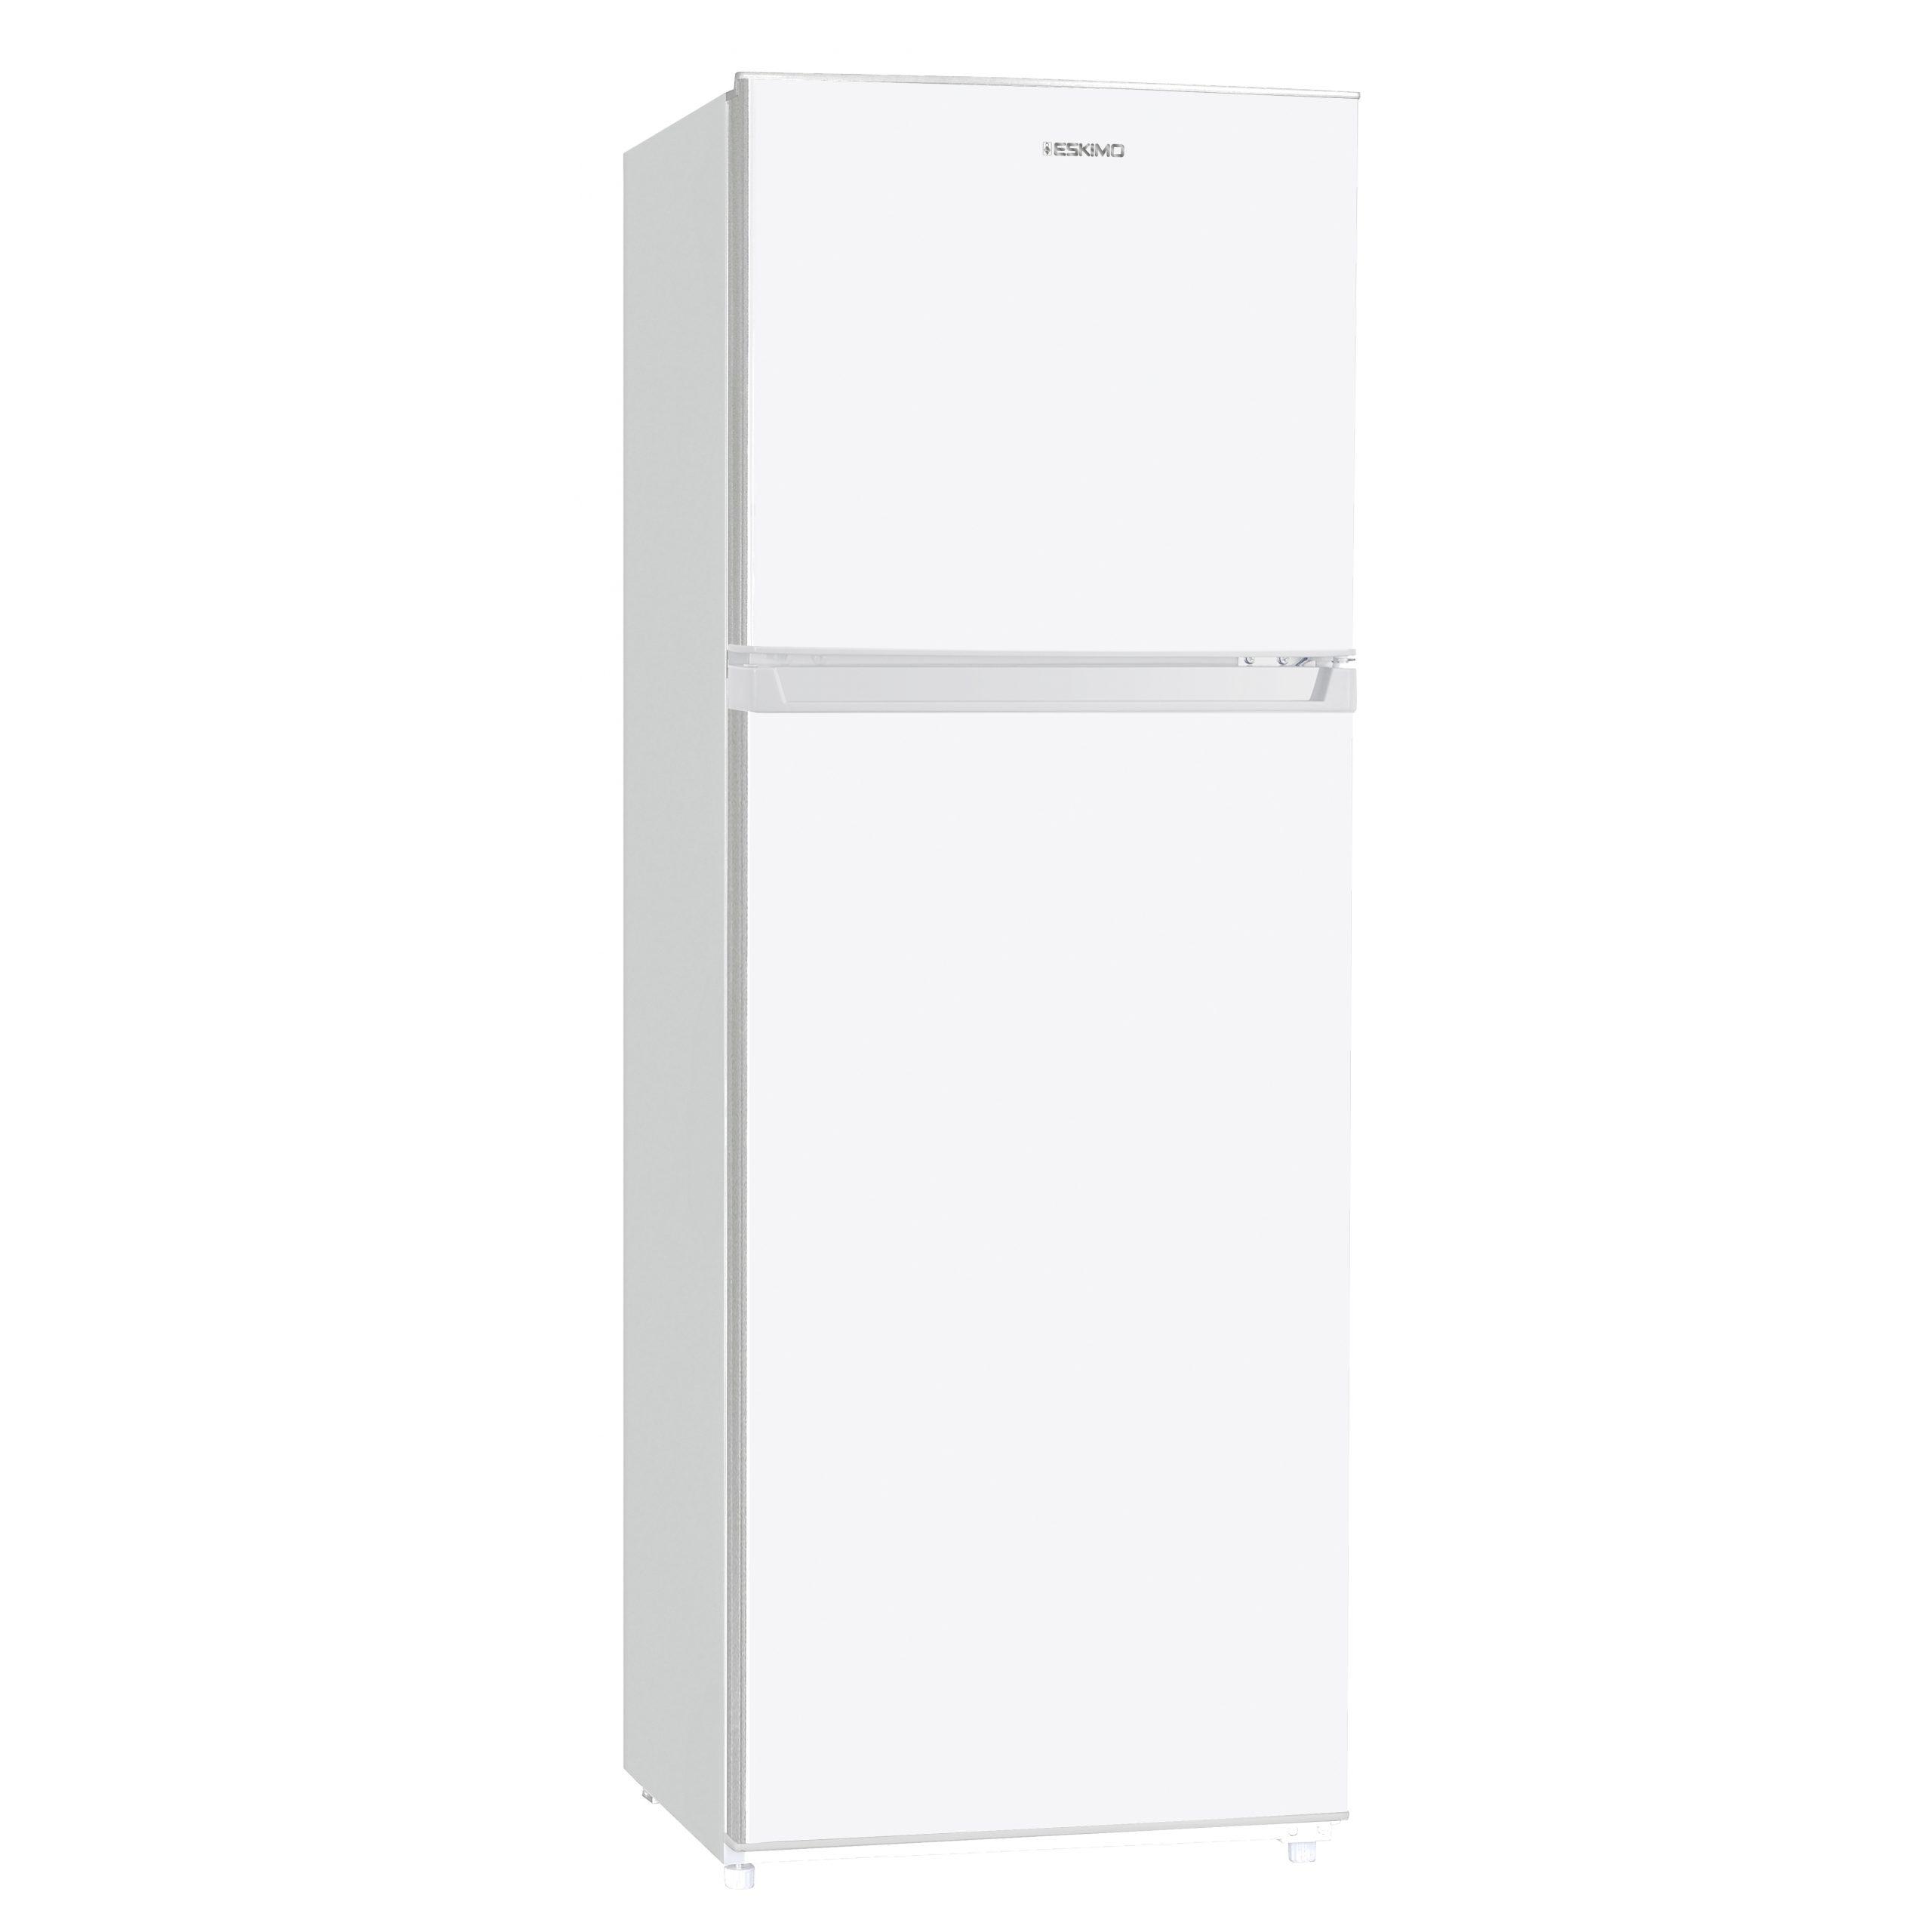 Eskimo Δίπορτο Ψυγείο ES 8444 NF W